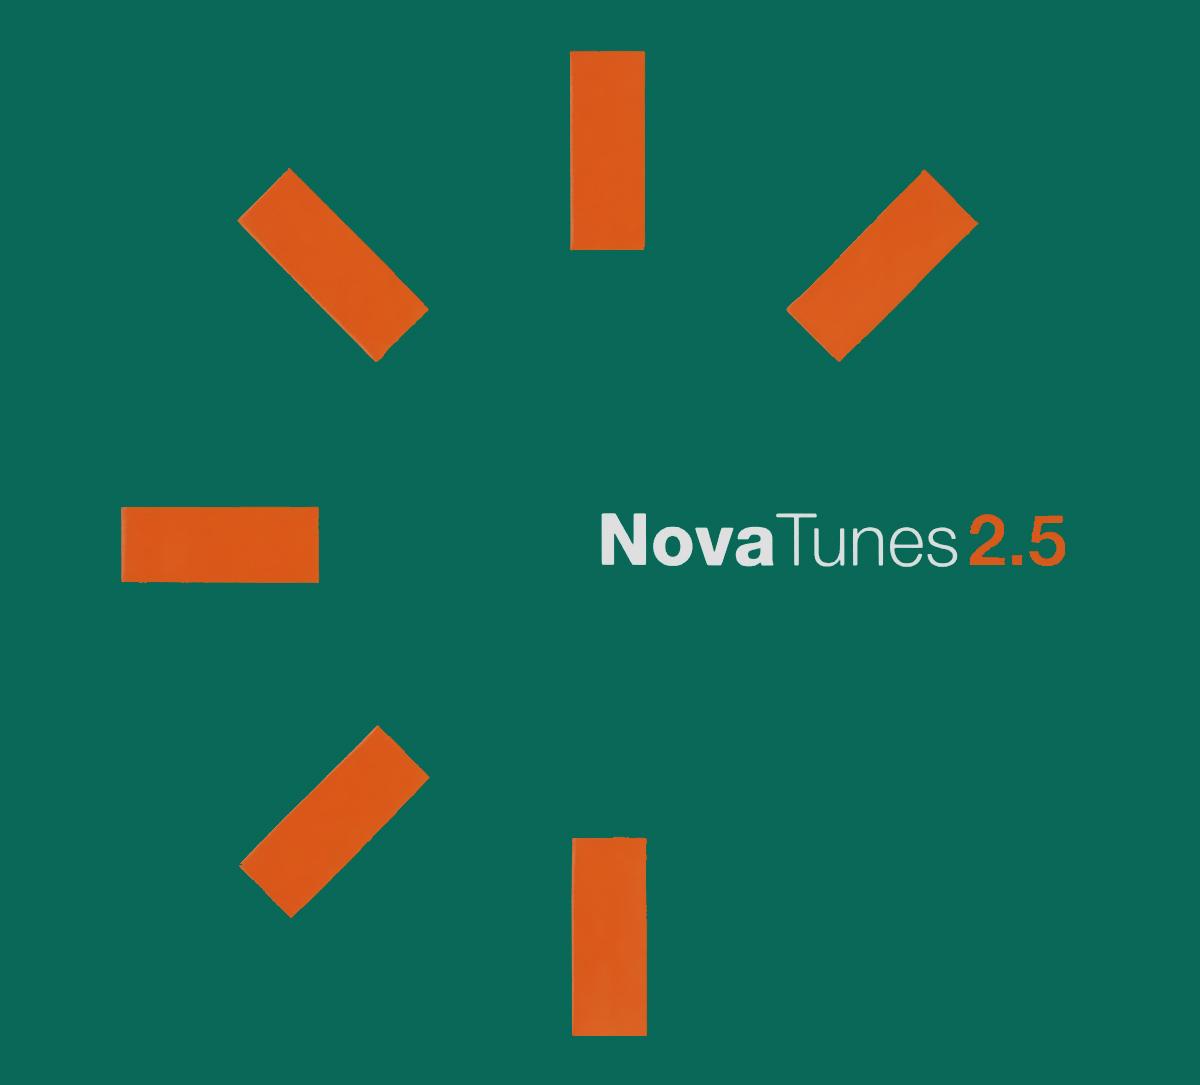 Nova Tunes 2.5 2012 Audio CD